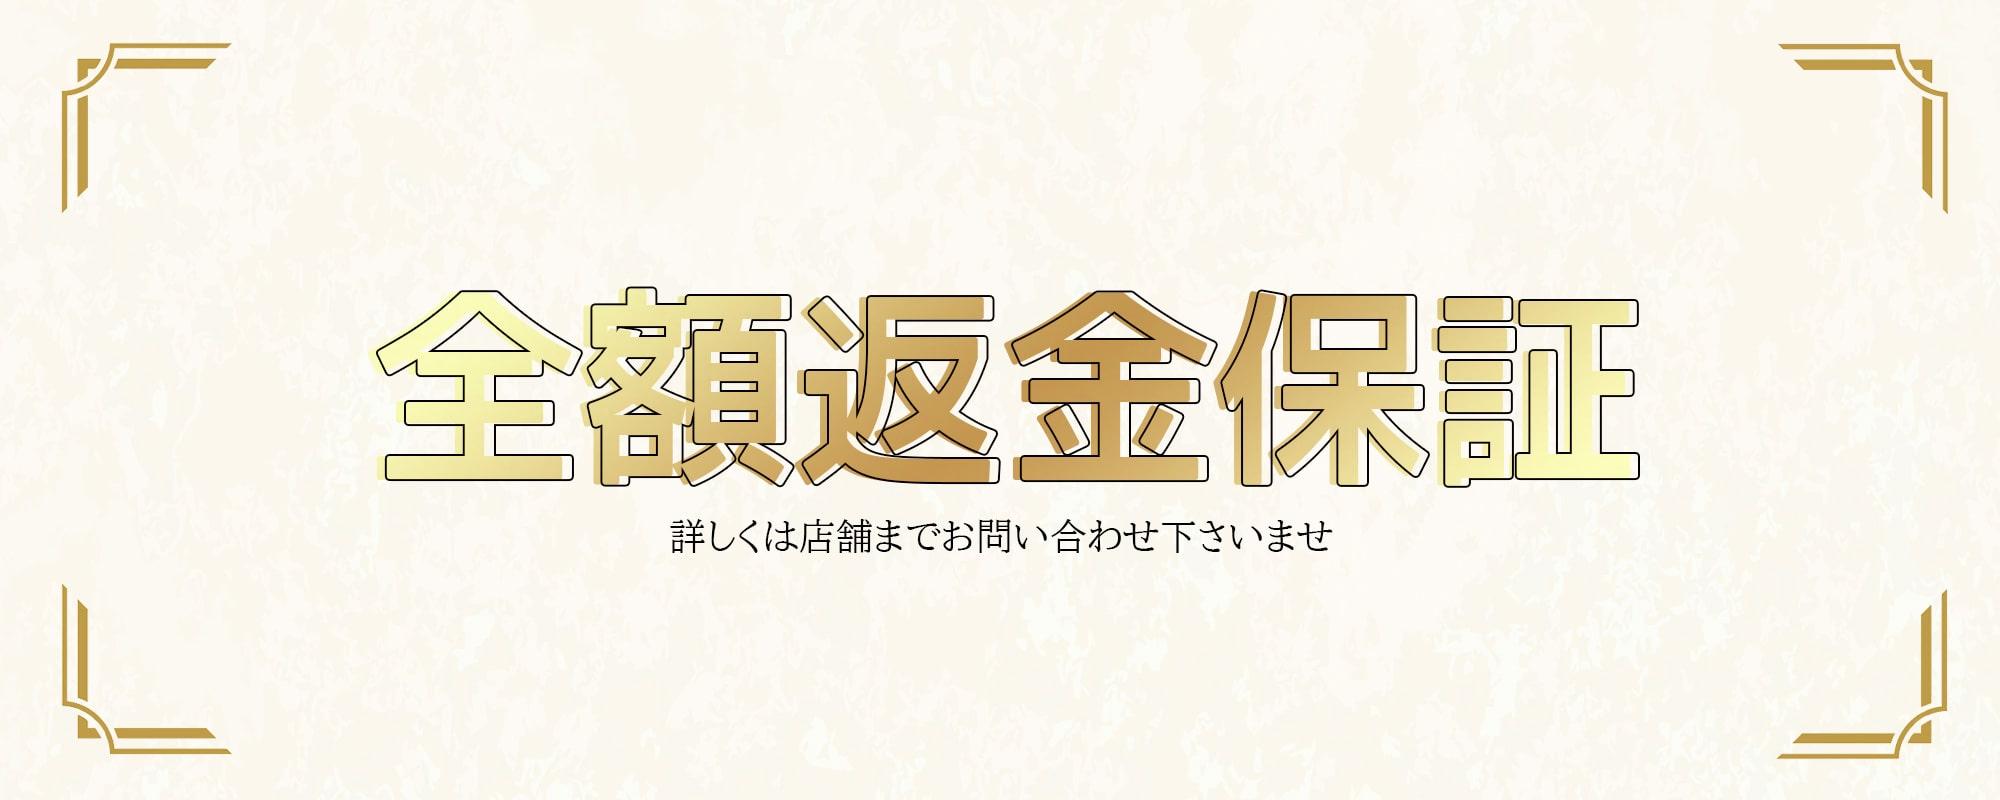 main_image05